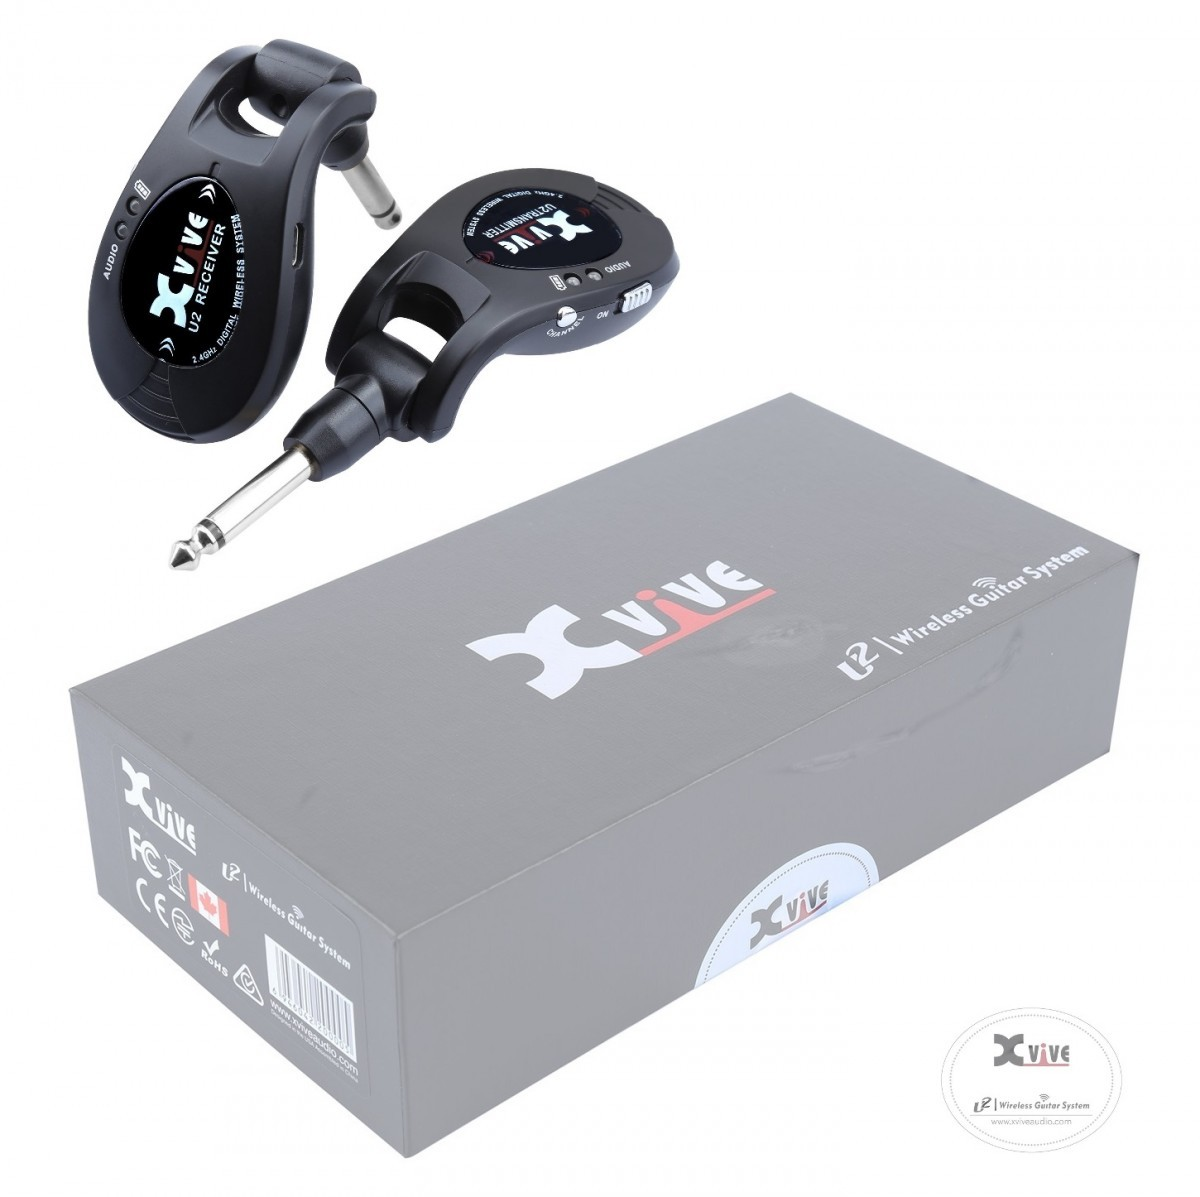 Xvive XV-U2 B デジタル ワイヤレスシステム ブラック XV U2